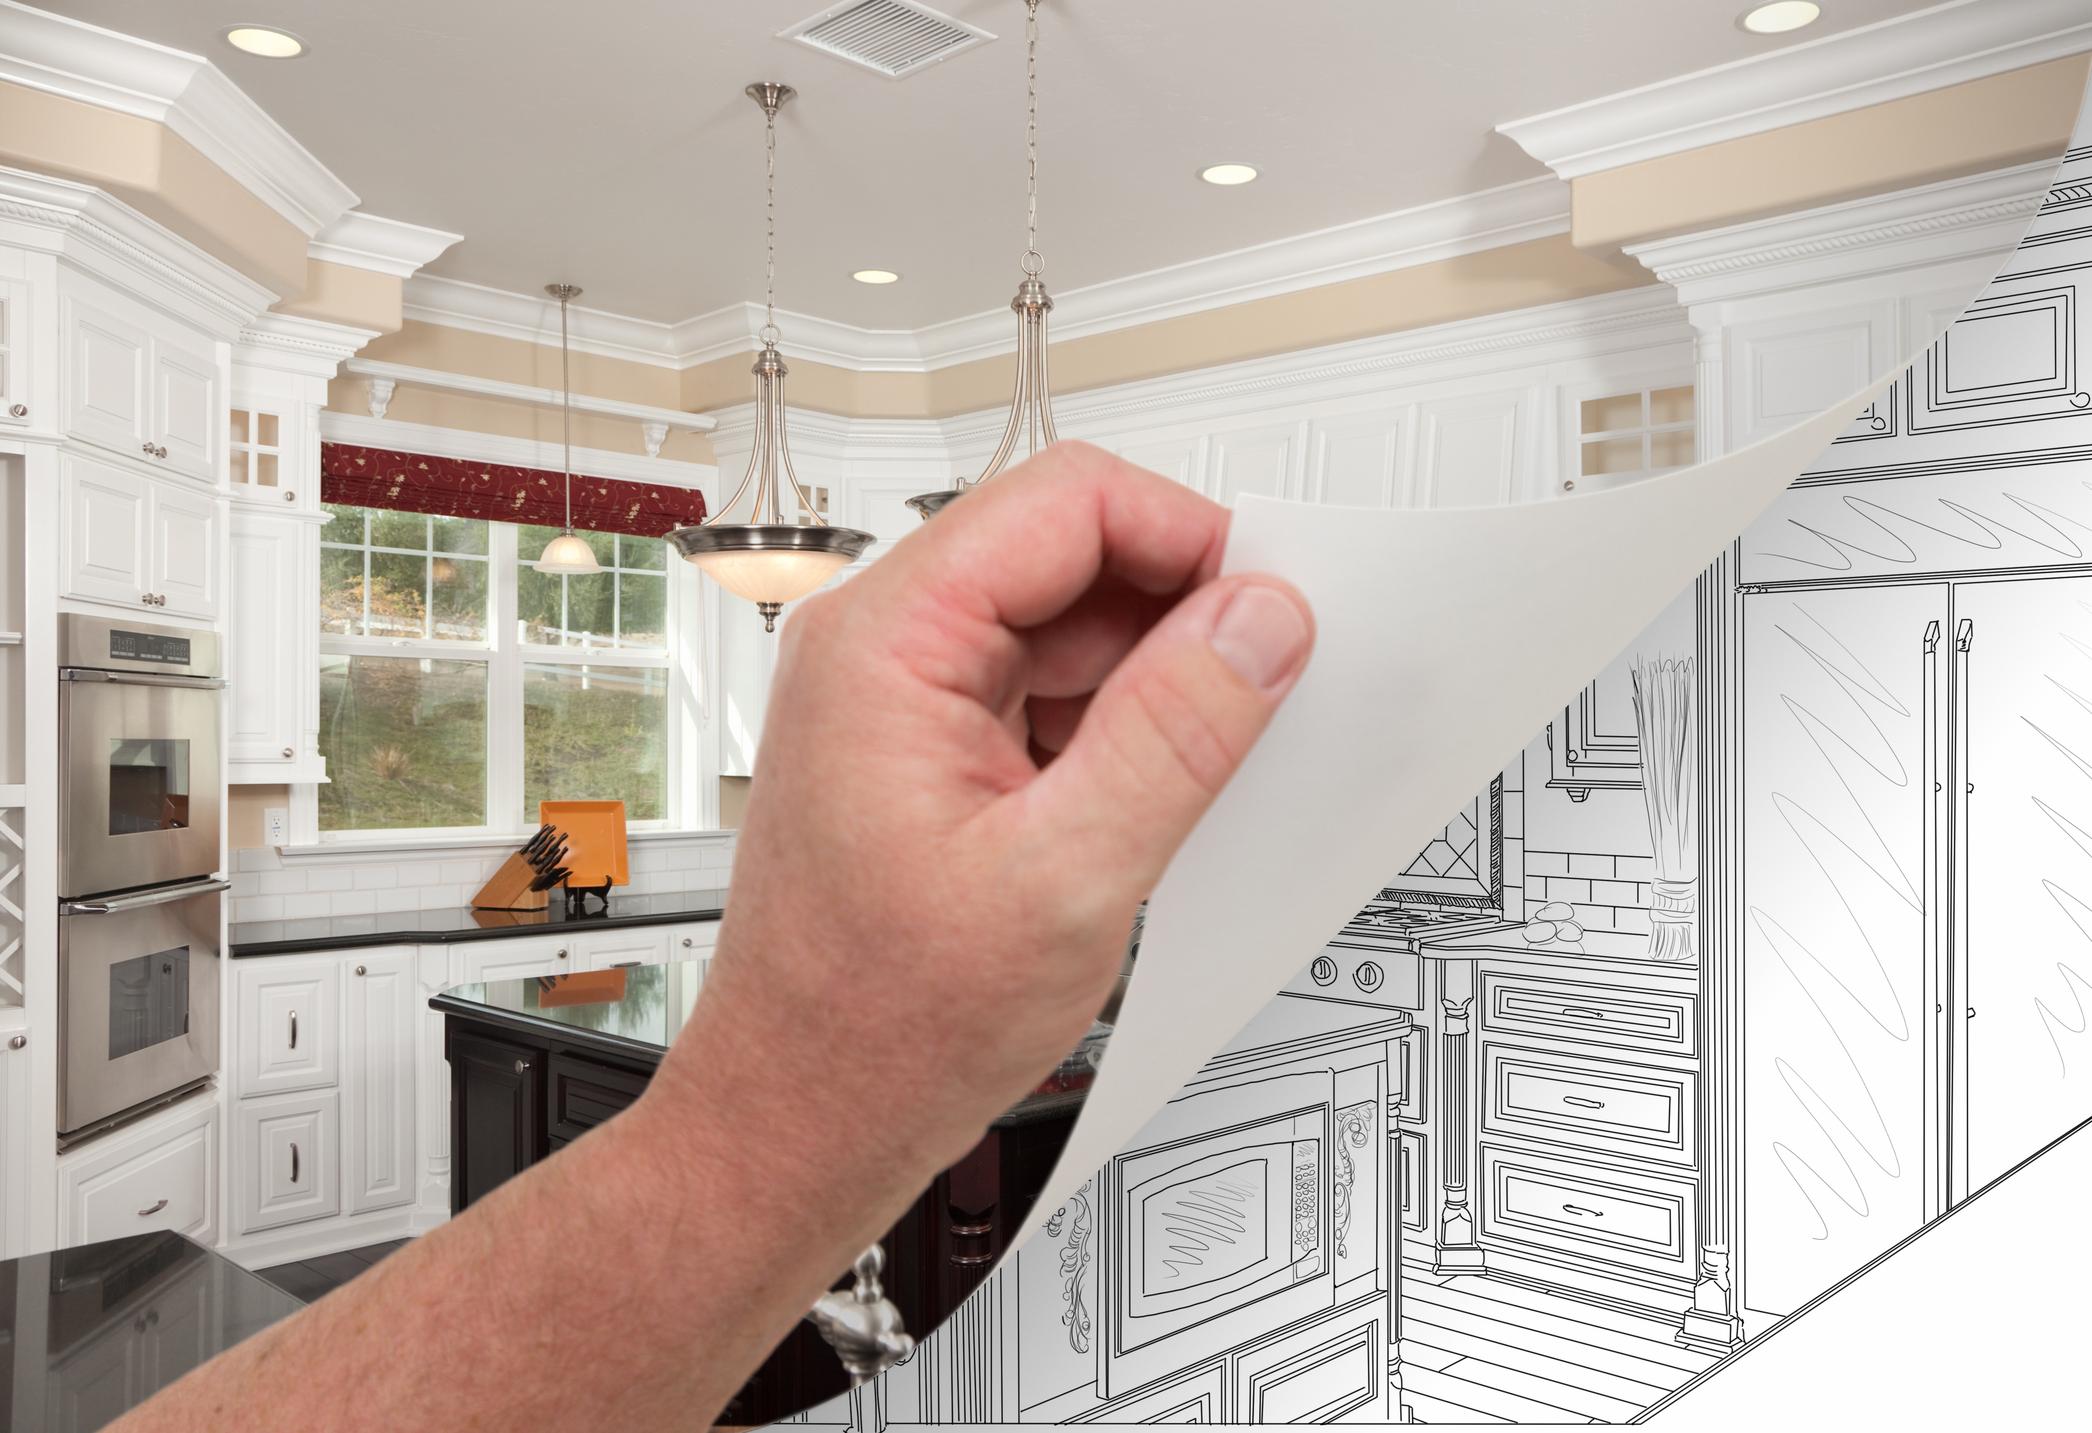 Kenny 39 s kansas city remodeling free interior design - Free interior design consultation ...